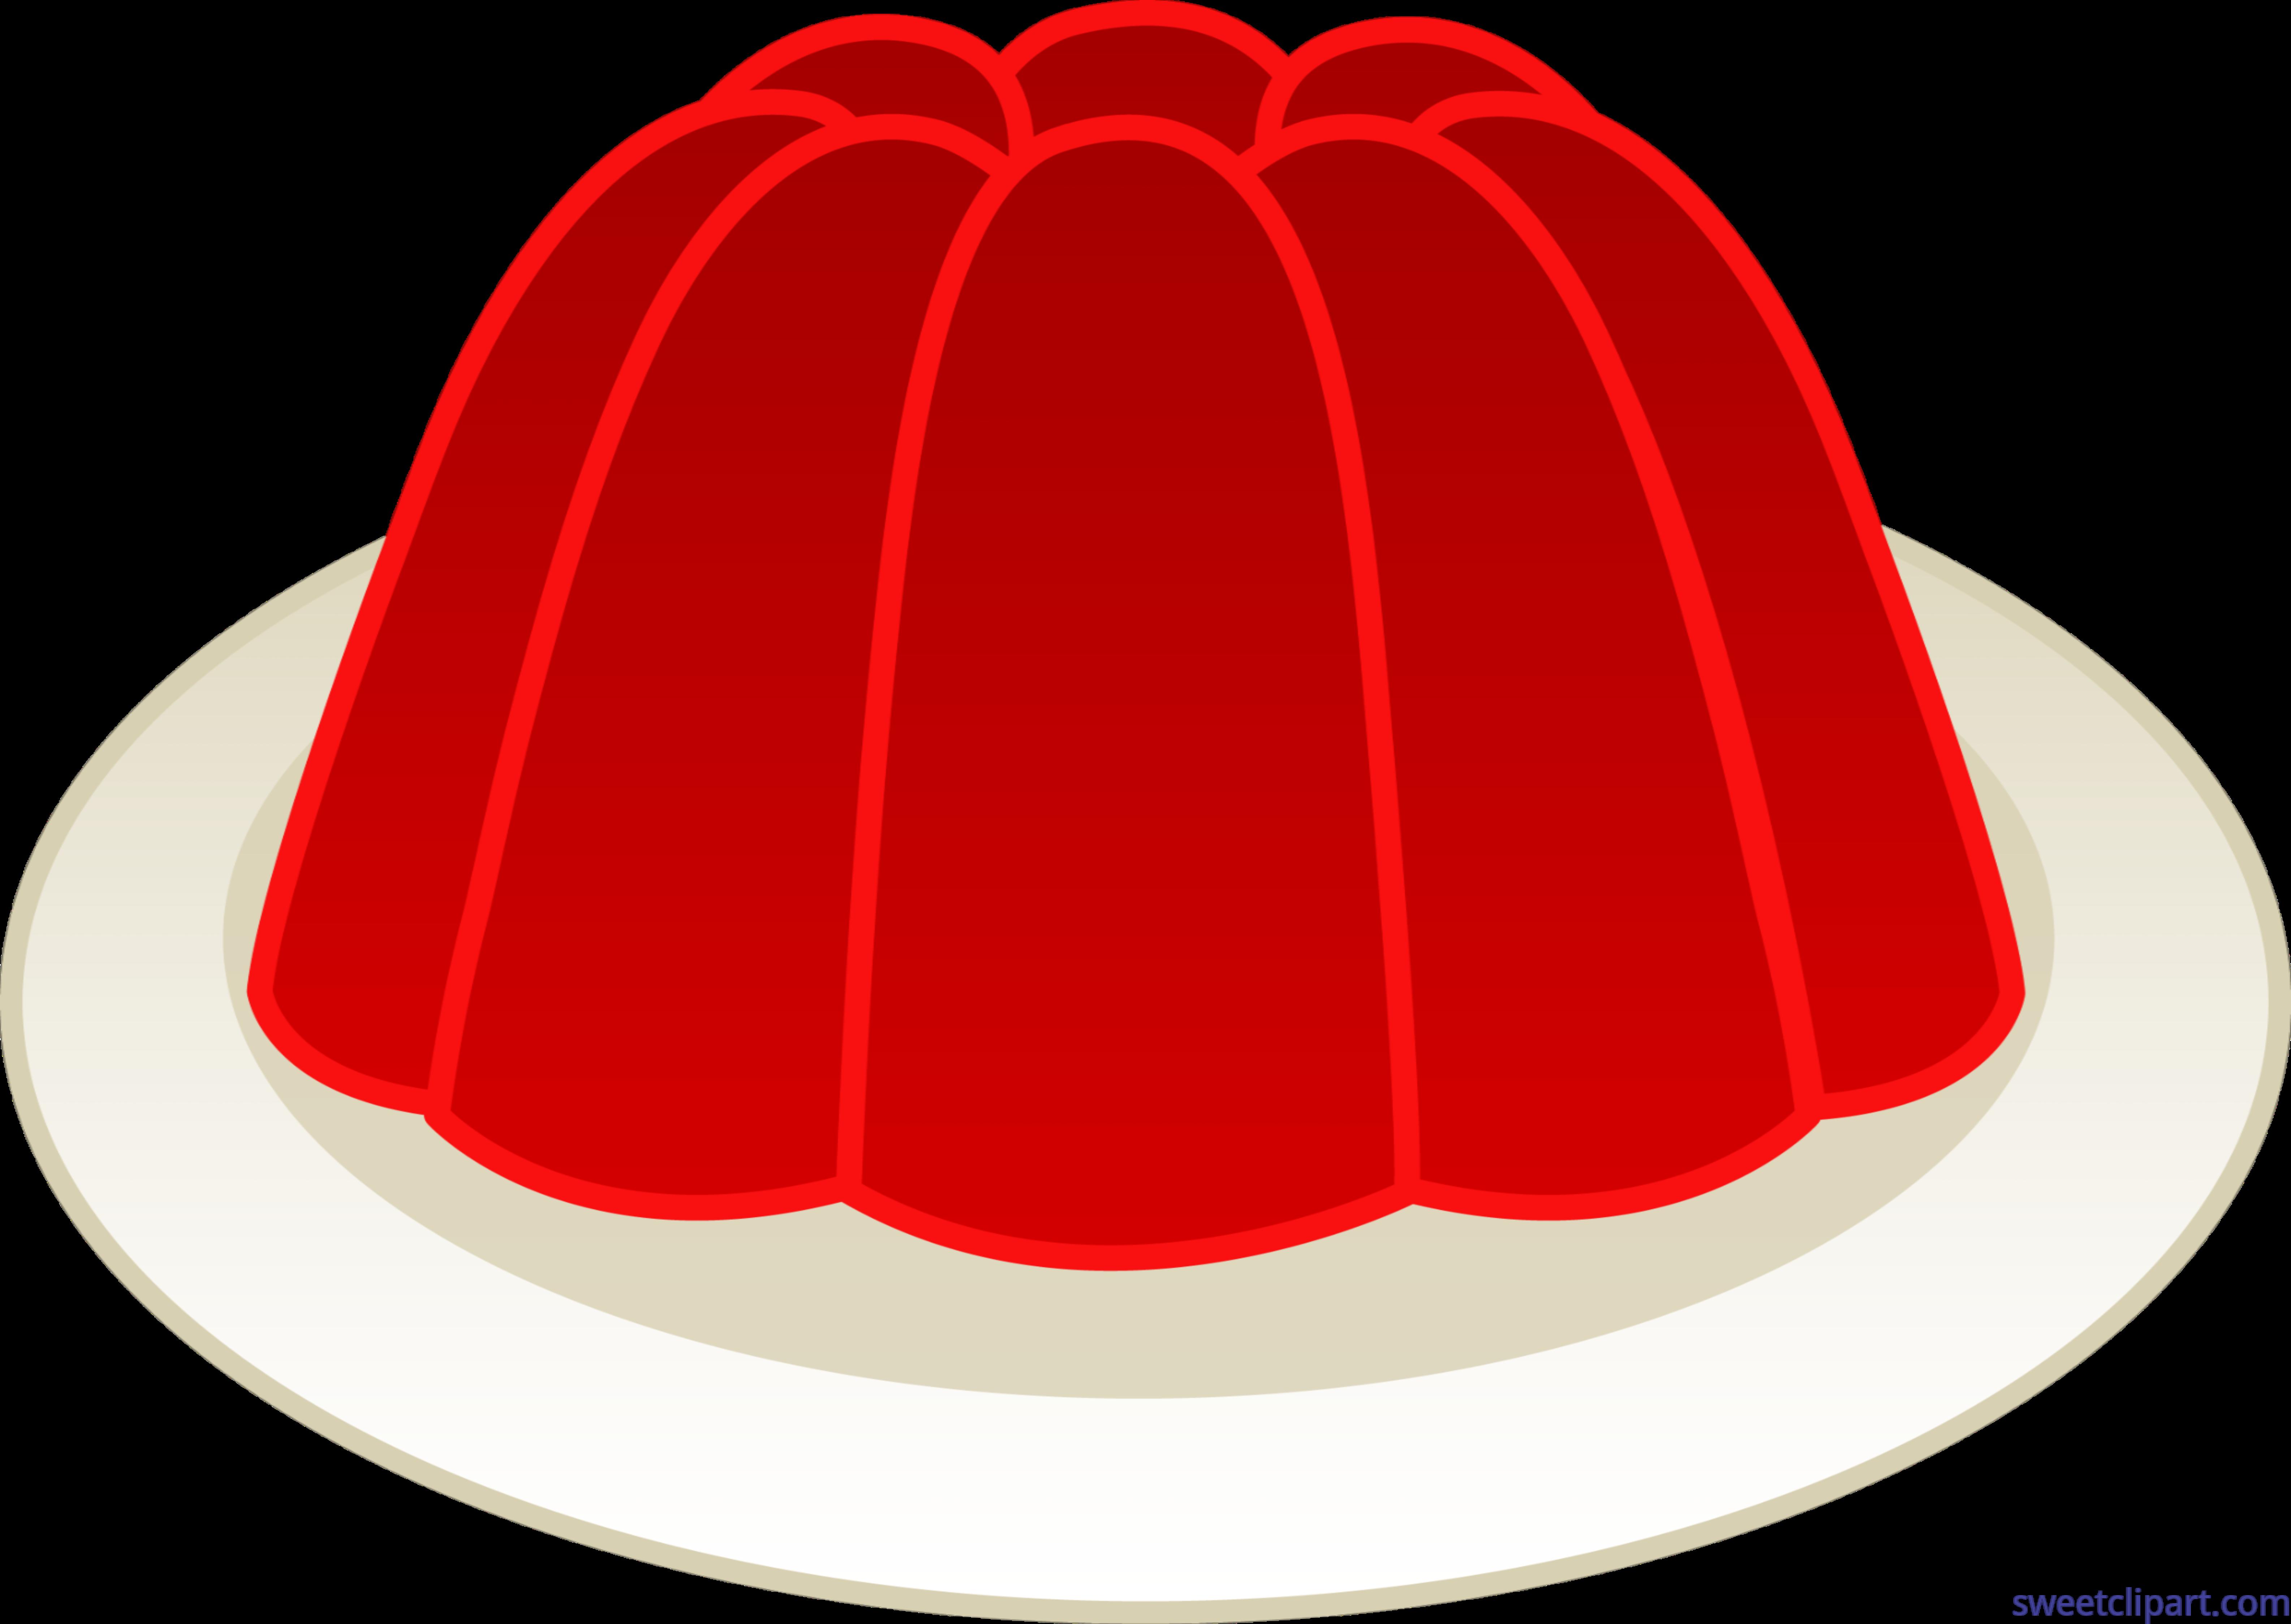 Desserts clipart clip art. Dessert at getdrawings com